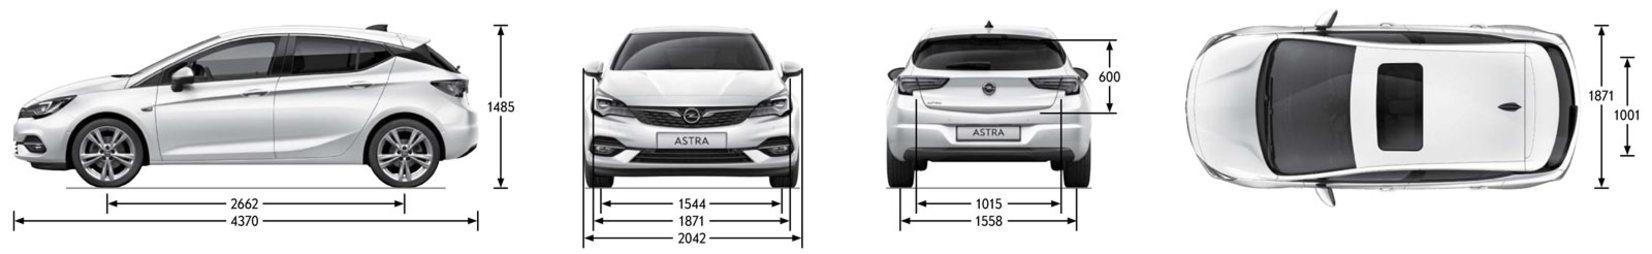 Opel Astra - wymiary